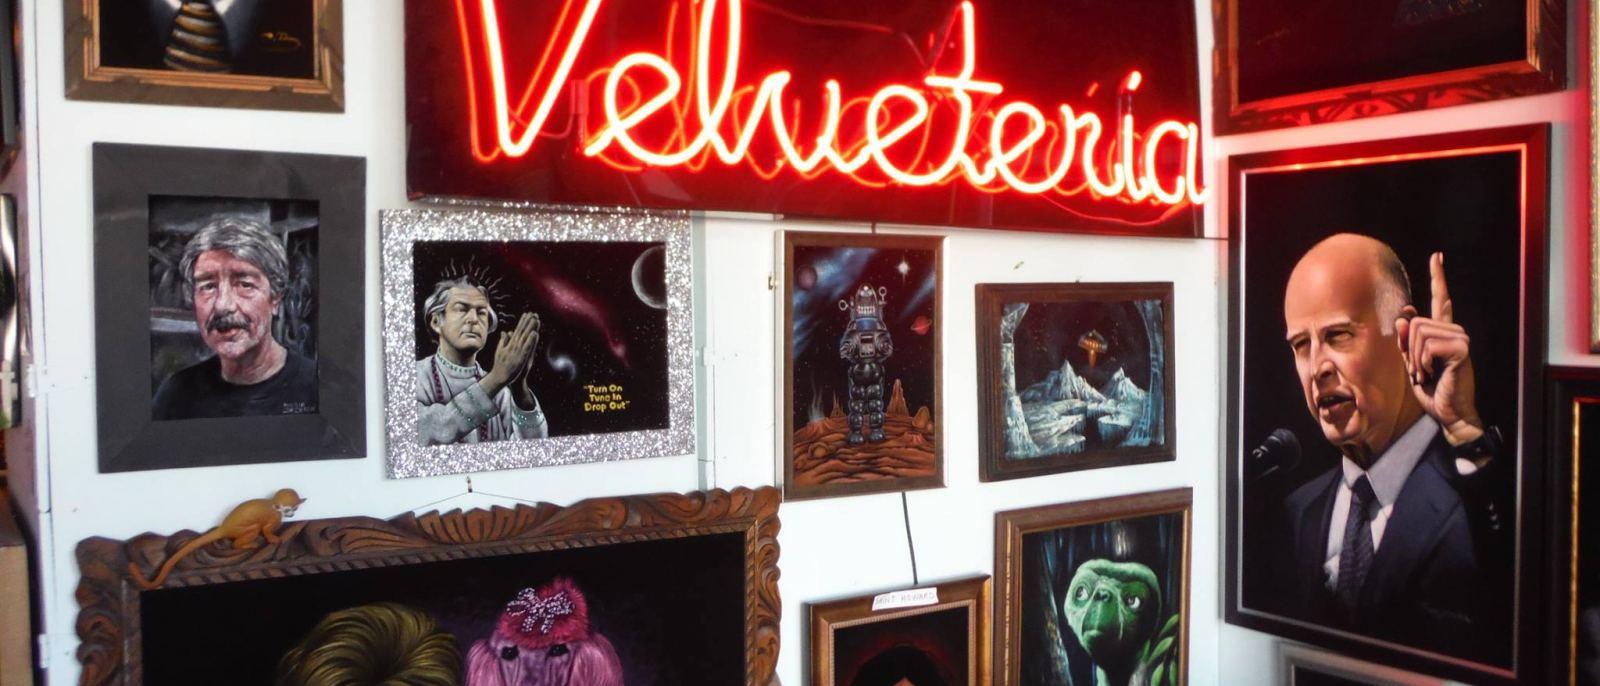 Velveteria in Chinatown